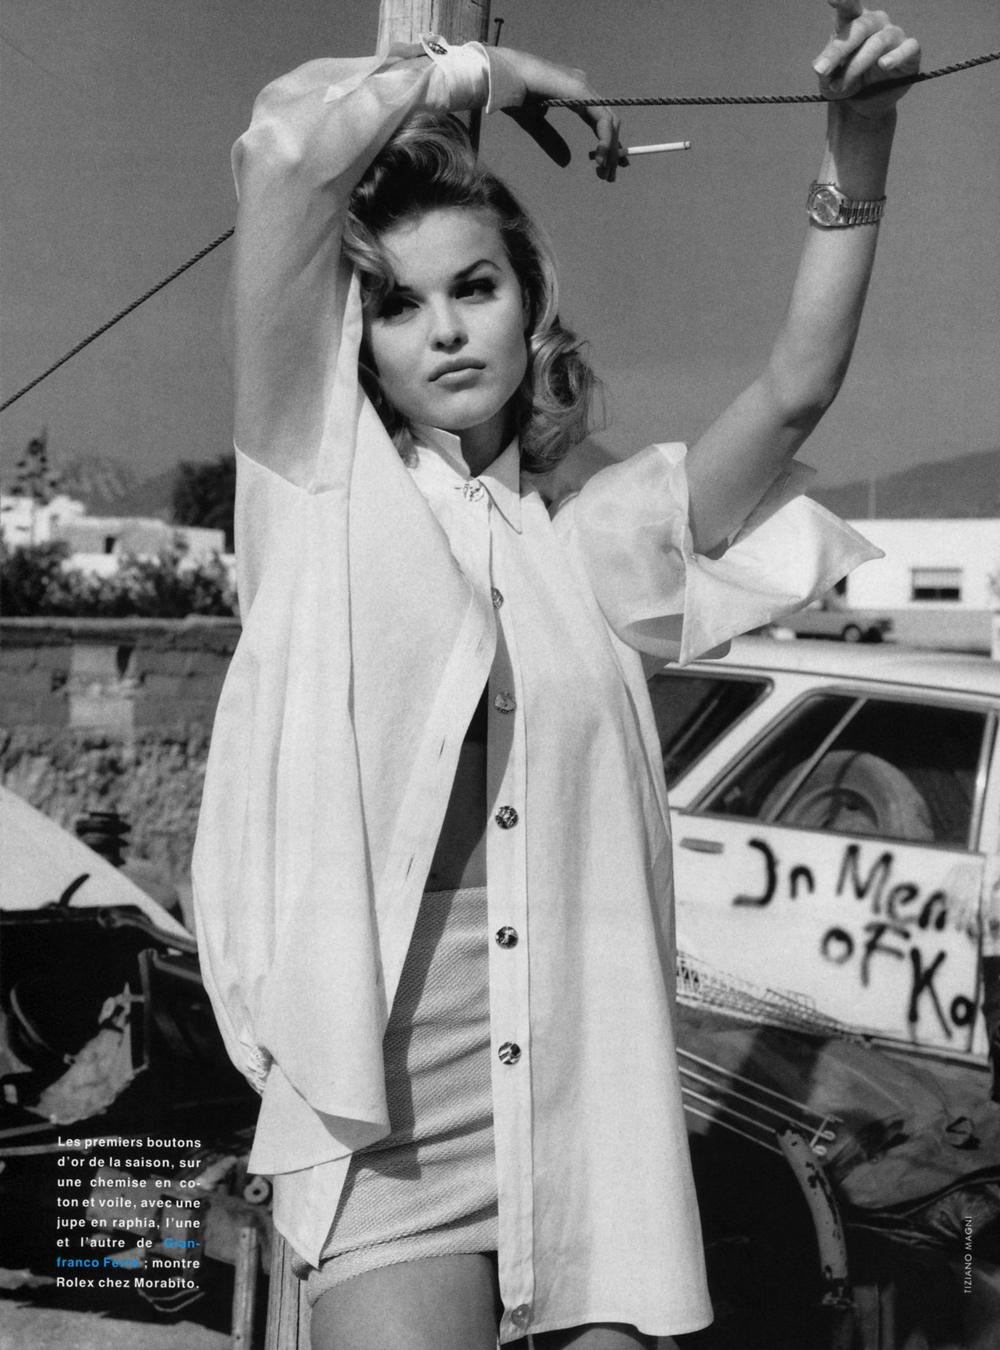 Glamour France April 1992 (photography: Tiziano Magni, styling: Carine Roitfeld (?)) via fashioned by love british fashion blog